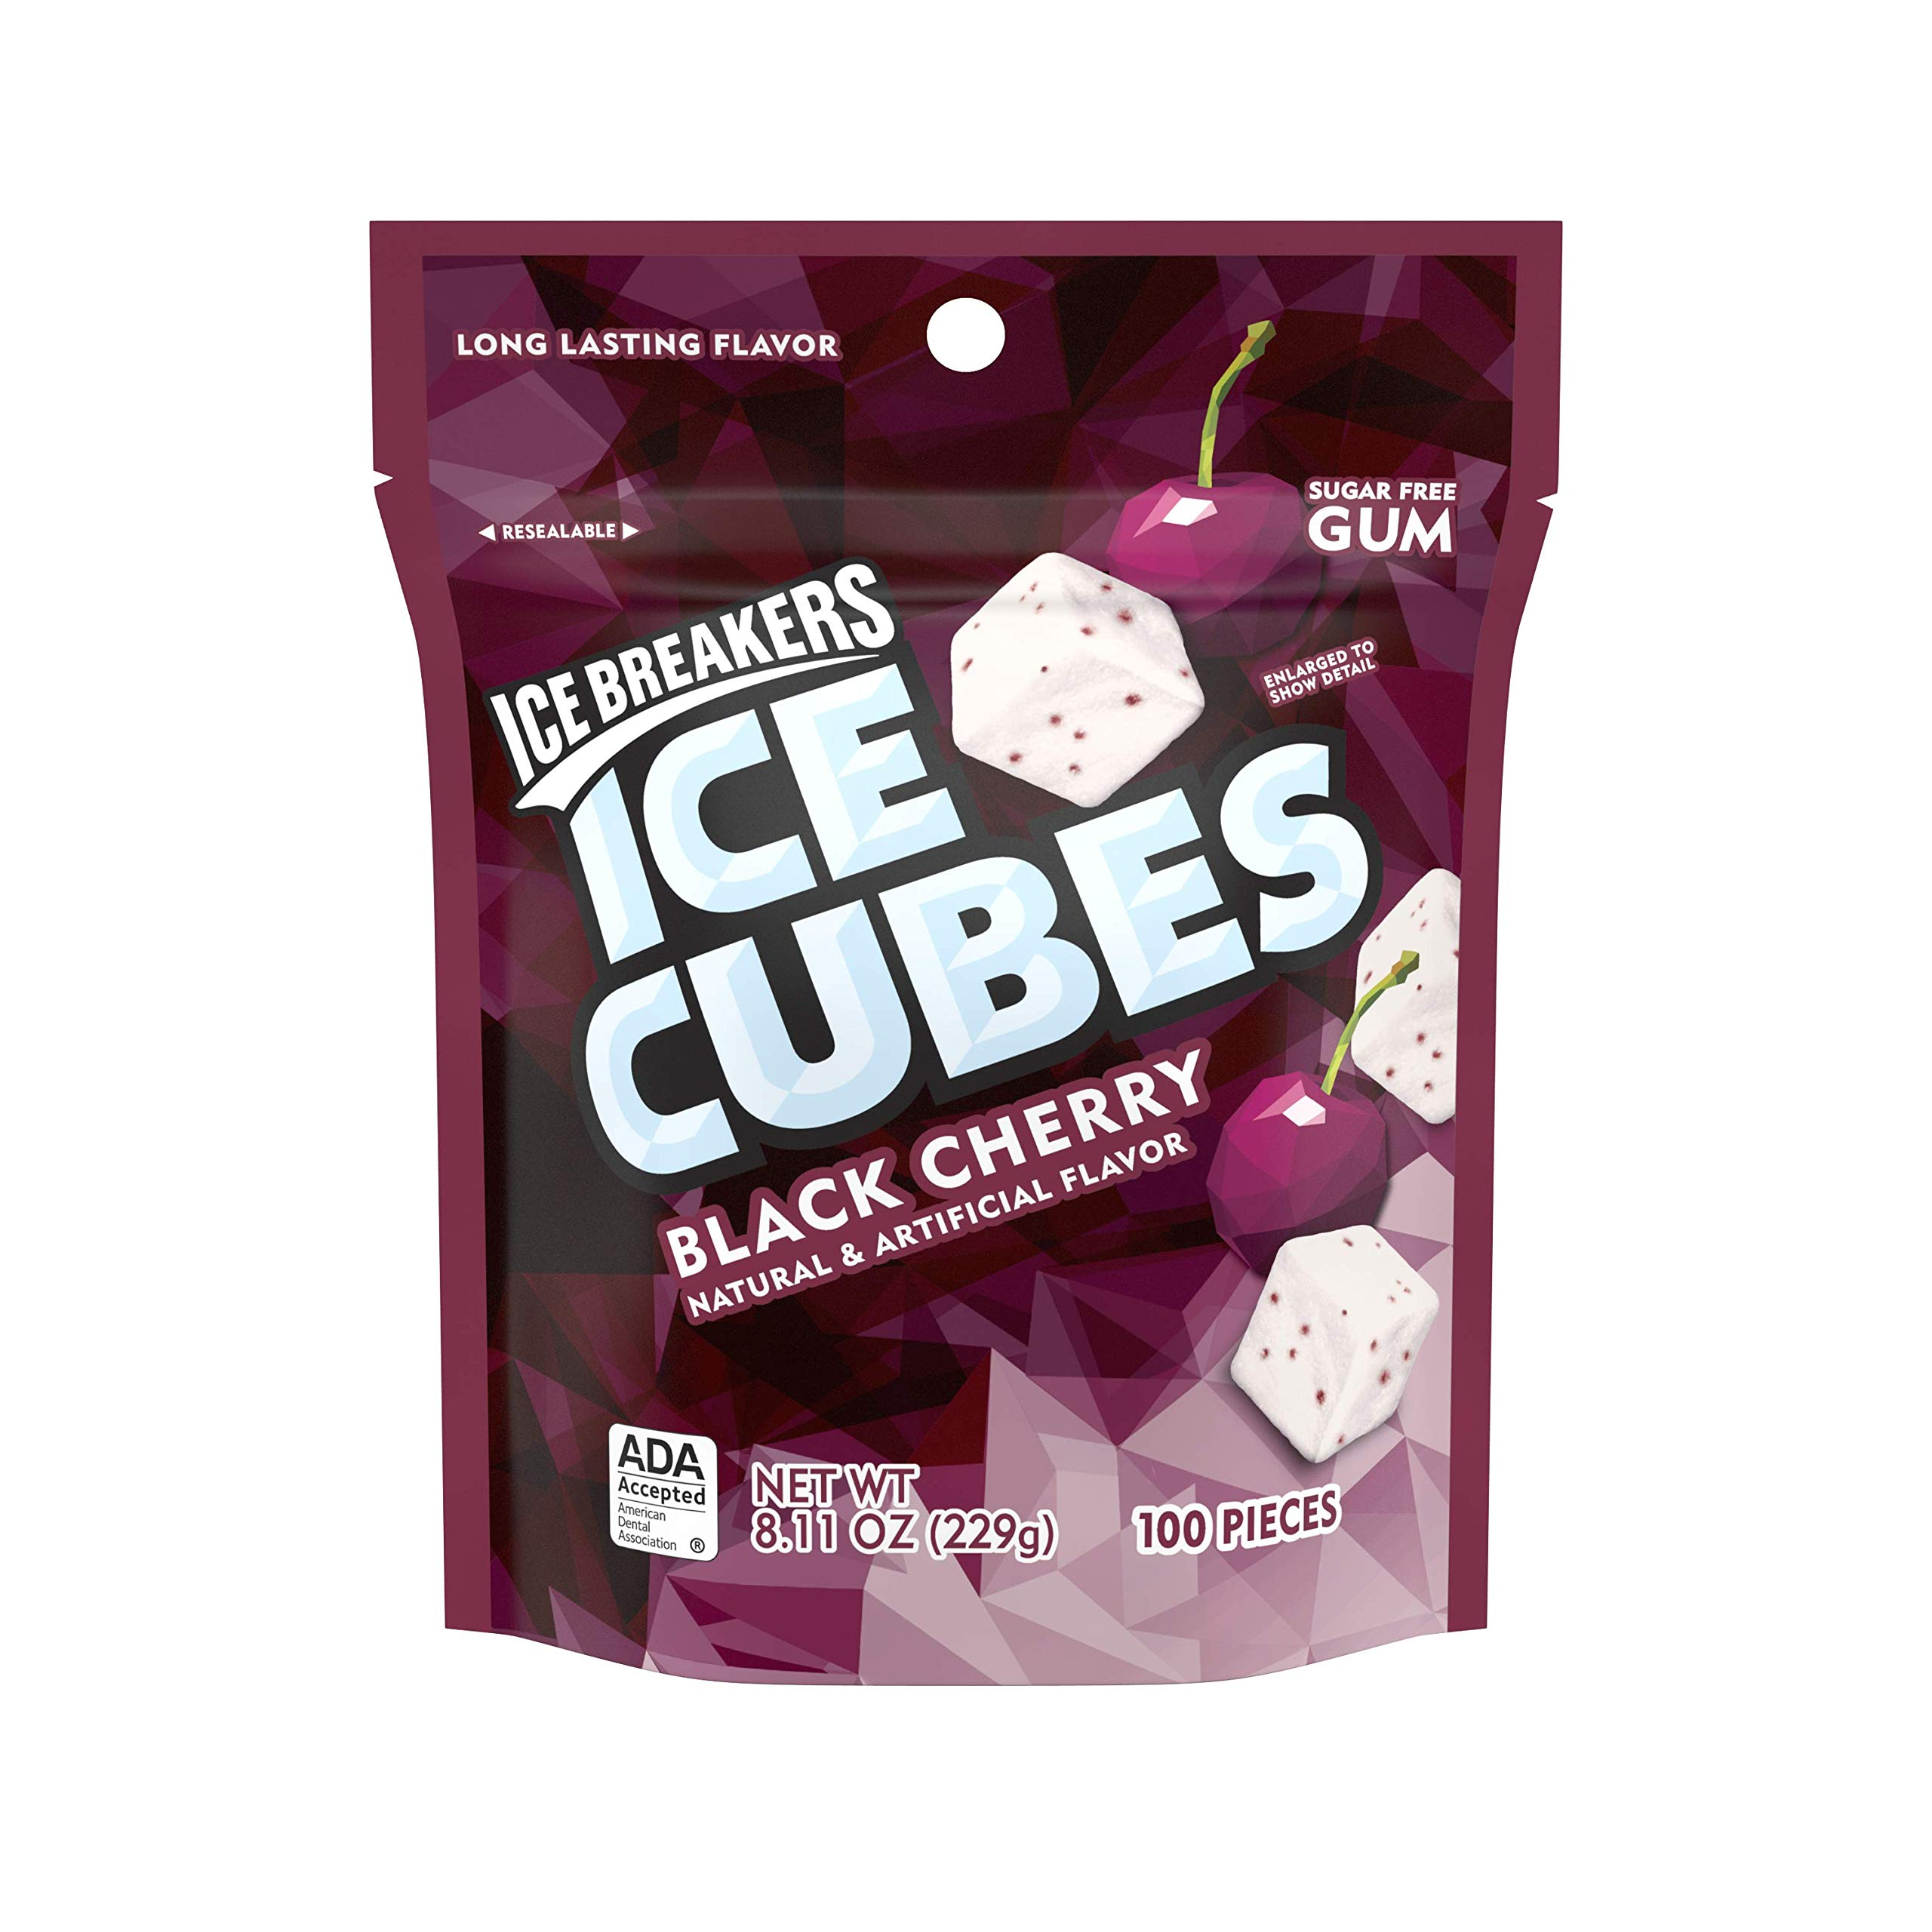 Ice Breakers Ice Cubes Sugar Free Black Cherry Gum, 8.11 Oz